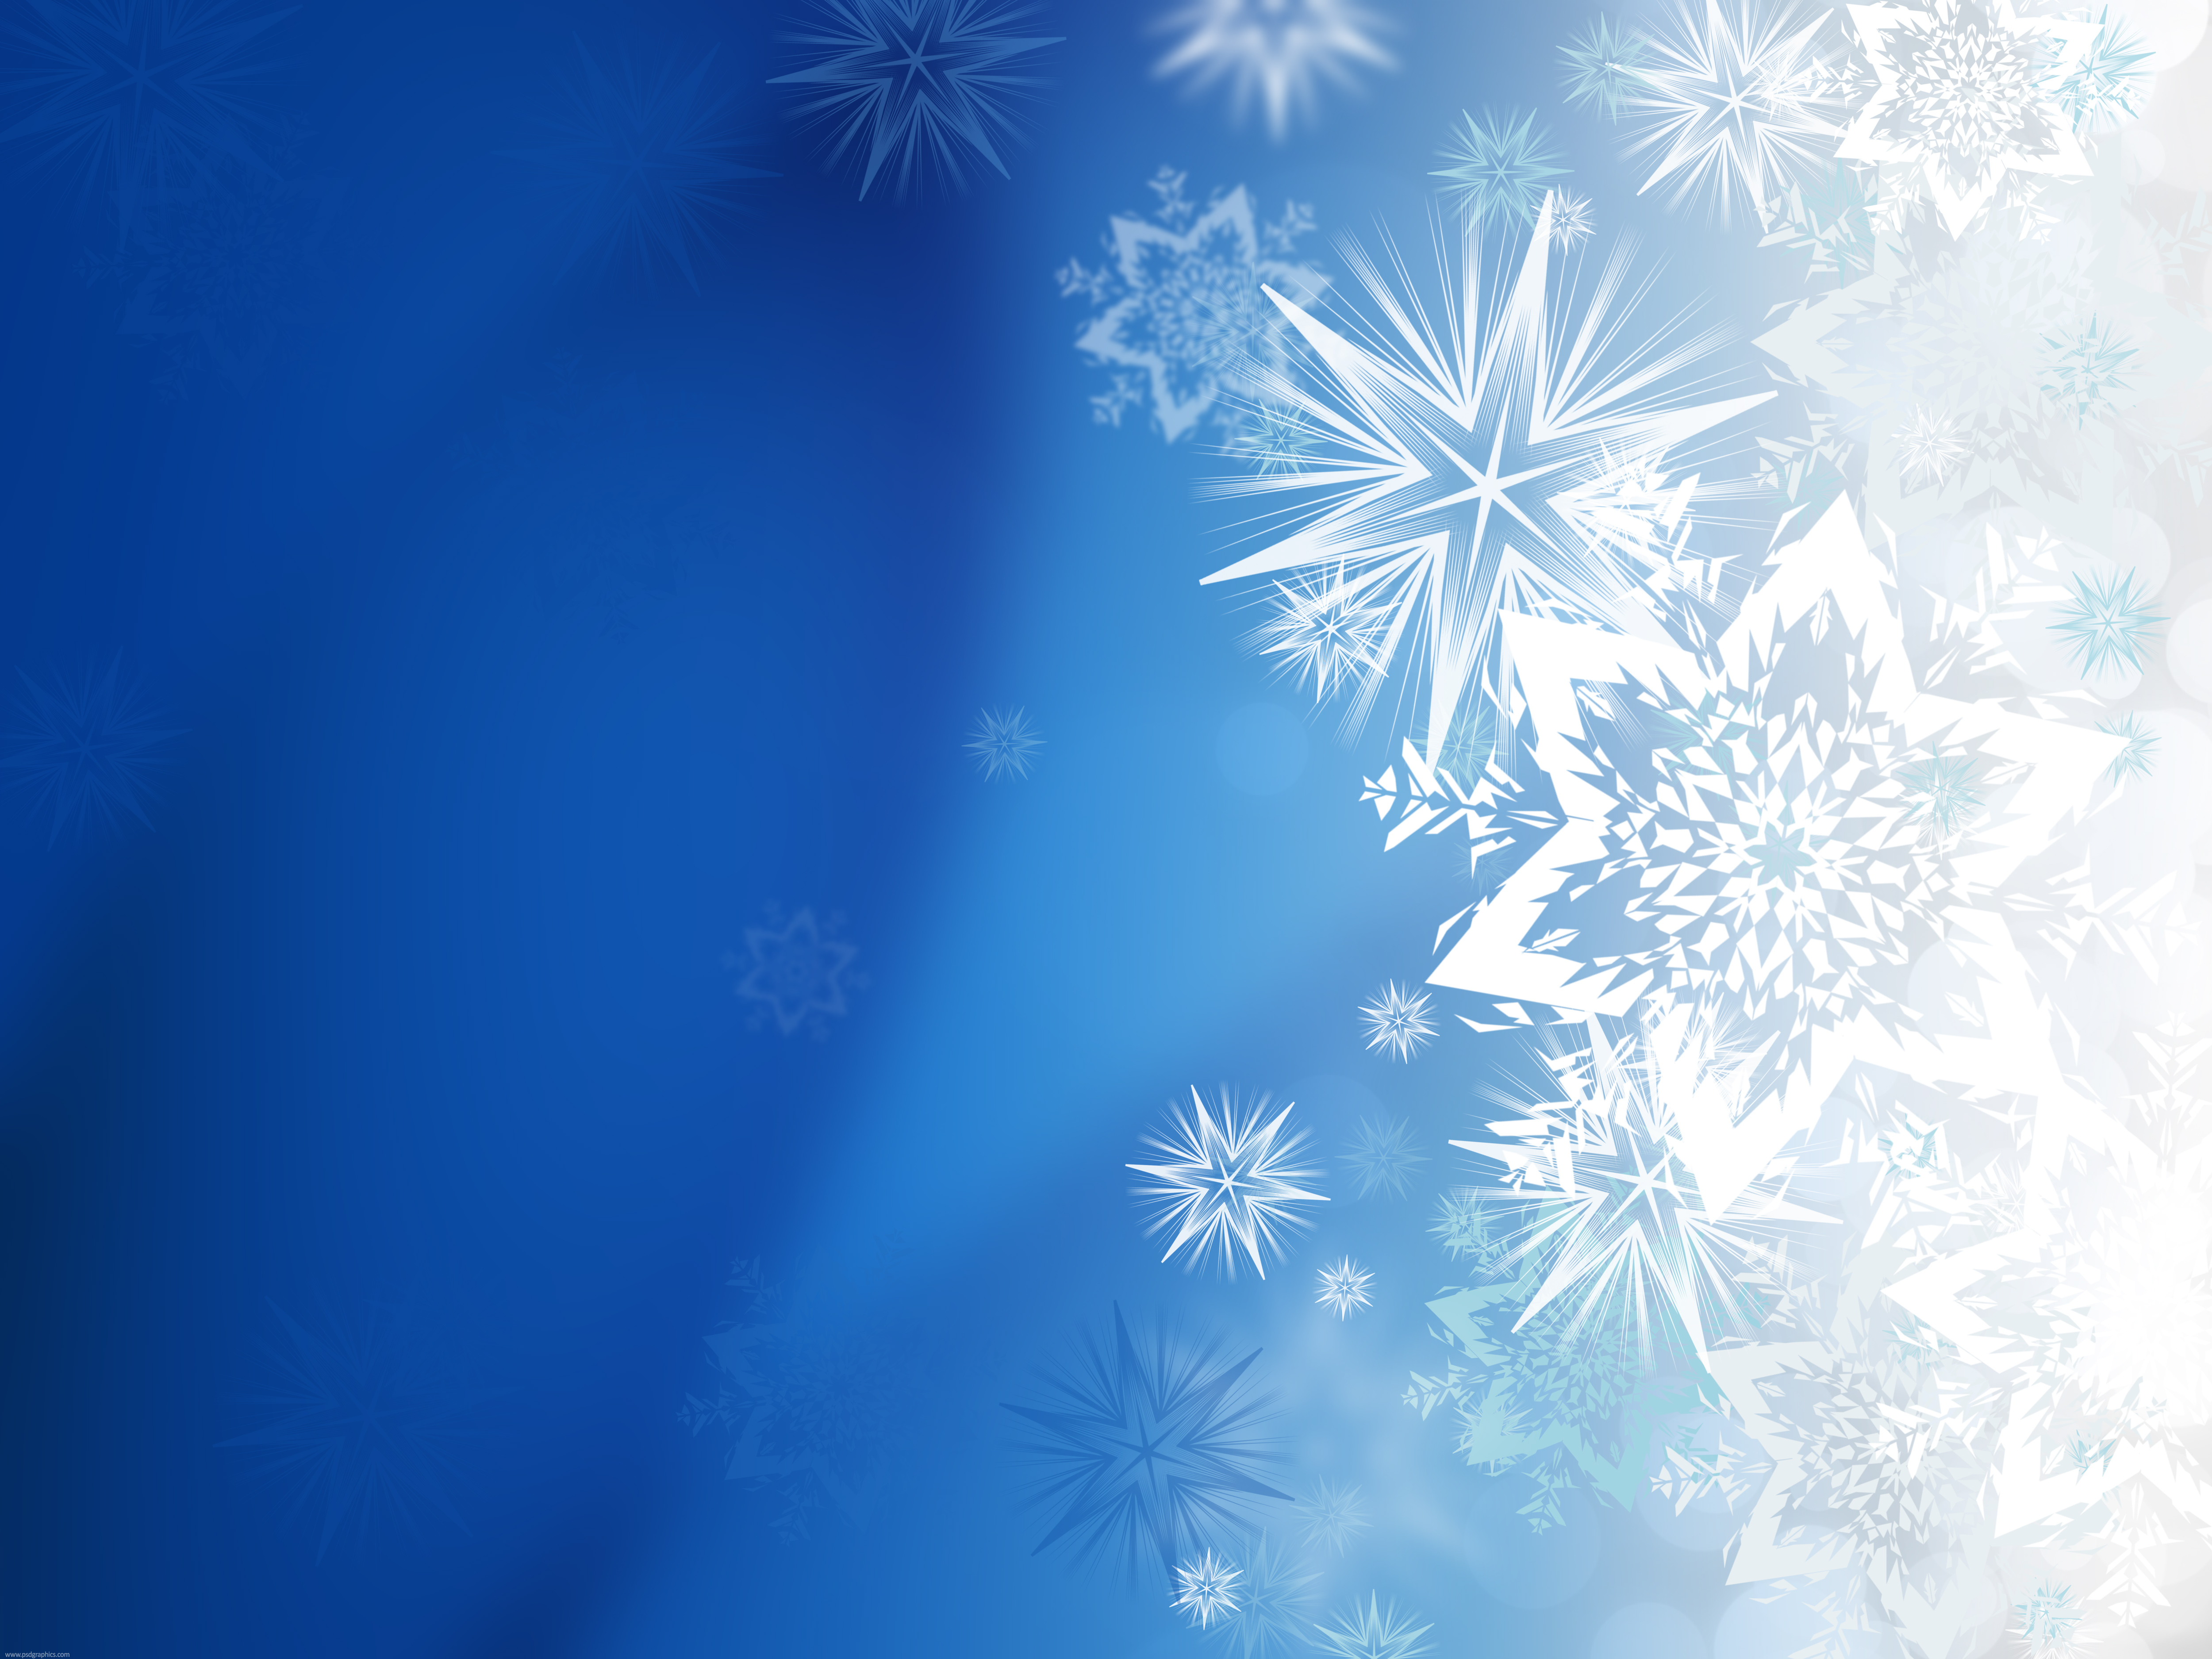 Magic winter background 5000x3750